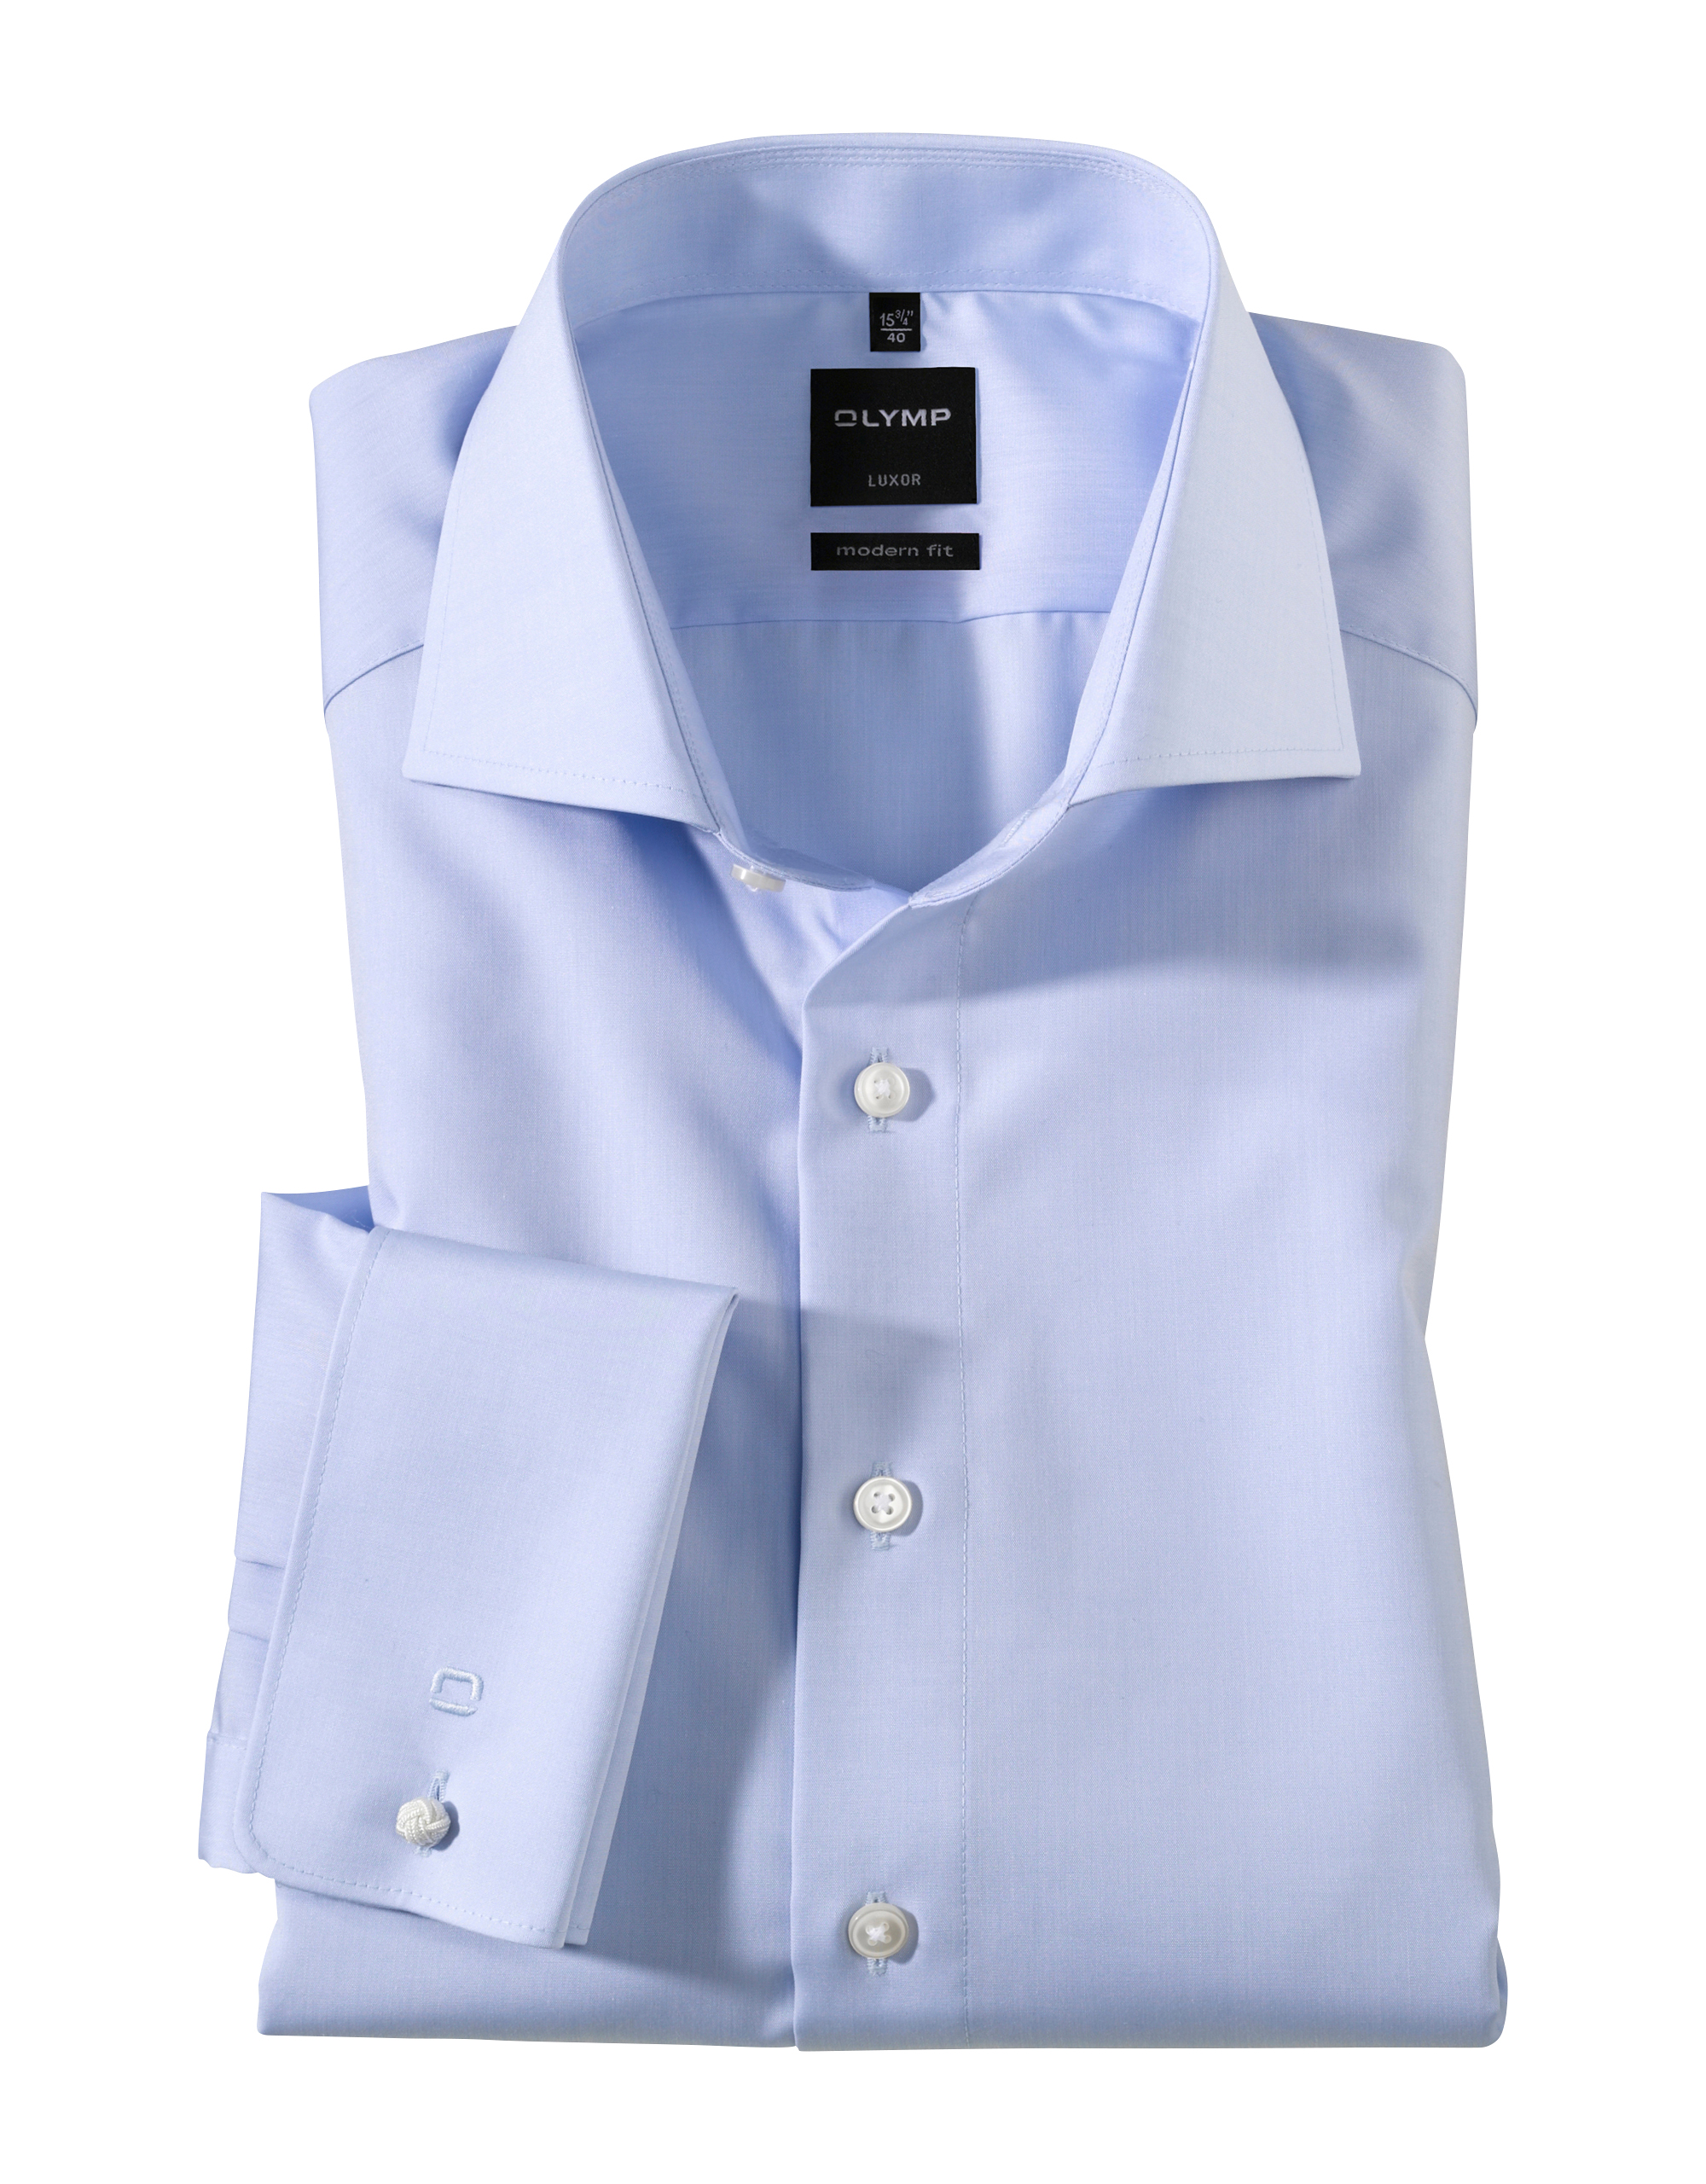 OLYMP Luxor Hochzeitshemd, modern fit, Extra langer Arm, Bleu, 44   Bekleidung > Hemden > Sonstige Hemden   Bleu   100% baumwolle   OLYMP Luxor